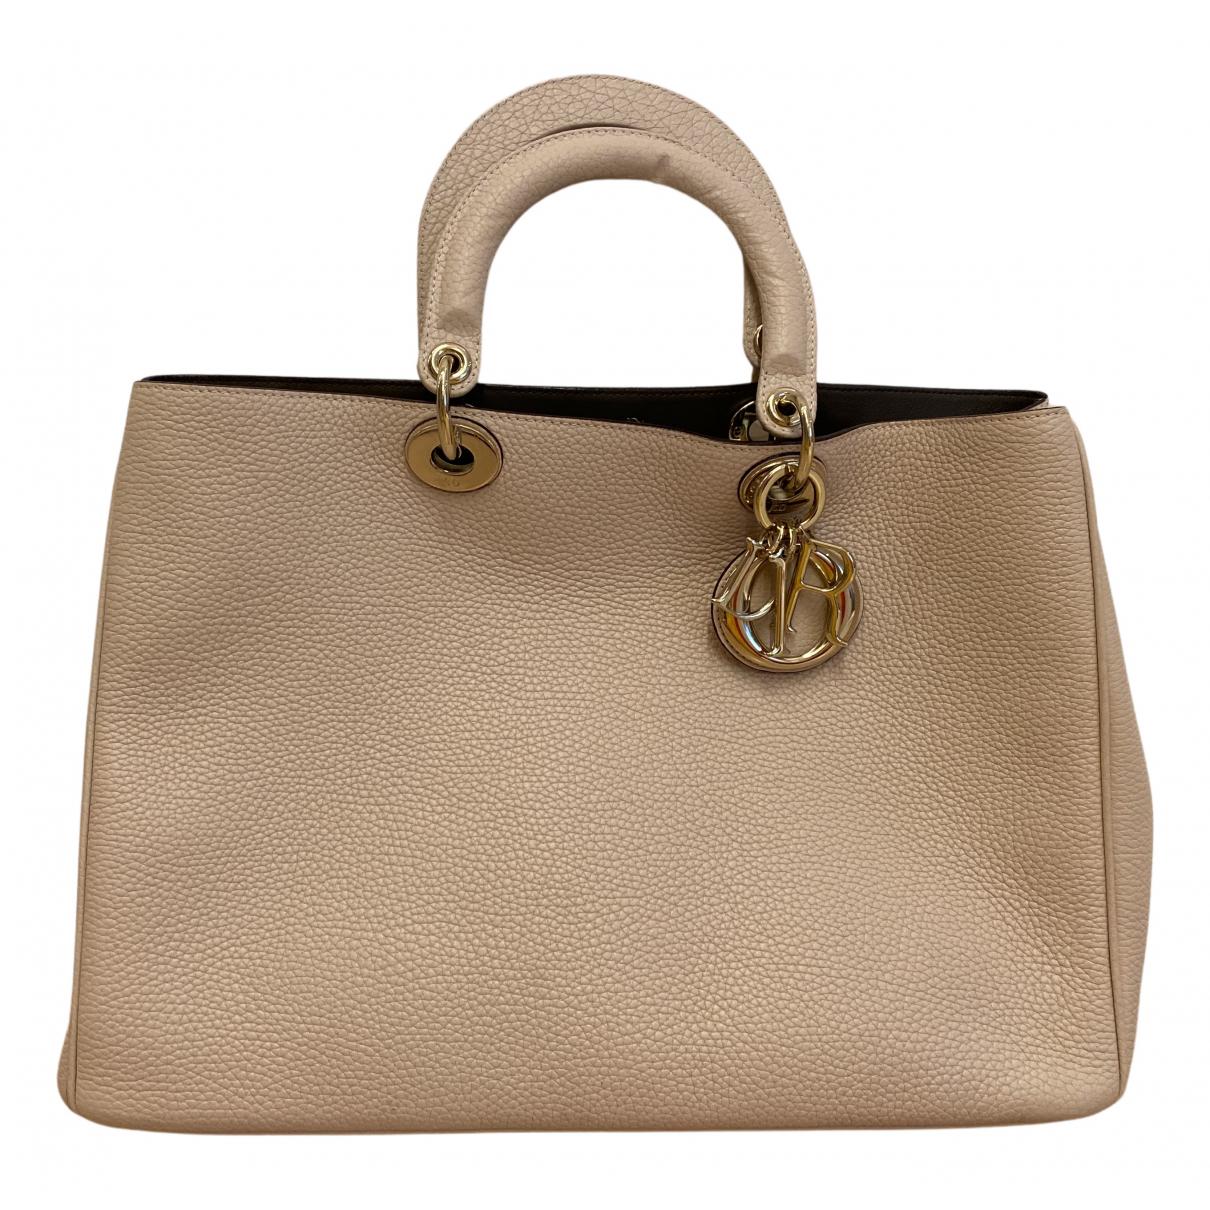 Dior Diorissimo Pink Leather handbag for Women N